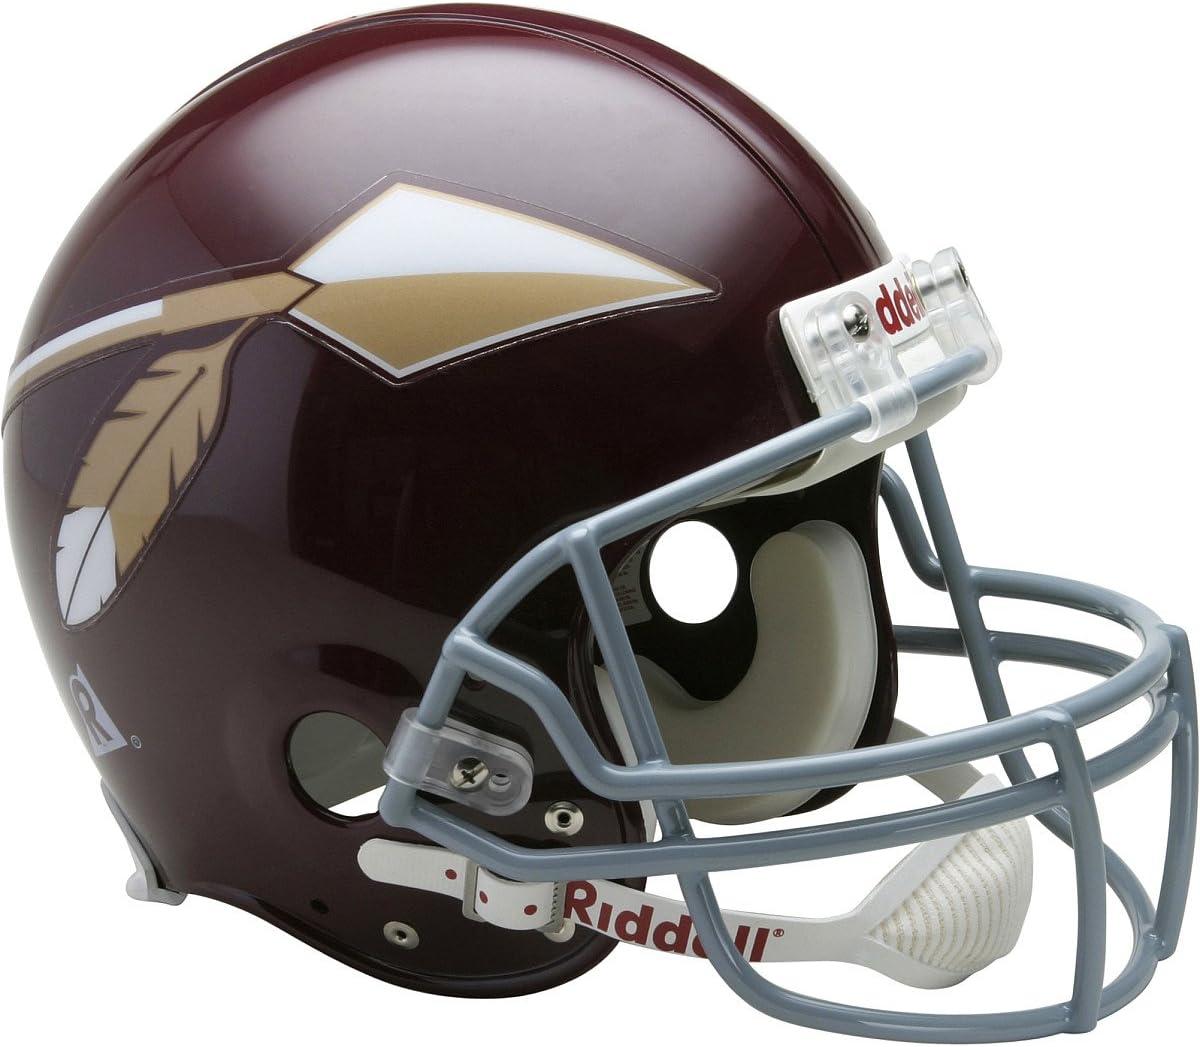 B0000C3GY8 Riddell Washington Redskins 1965-1969 Authentic Throwback Helmet 71eVN2BUh2BtL.SL1200_